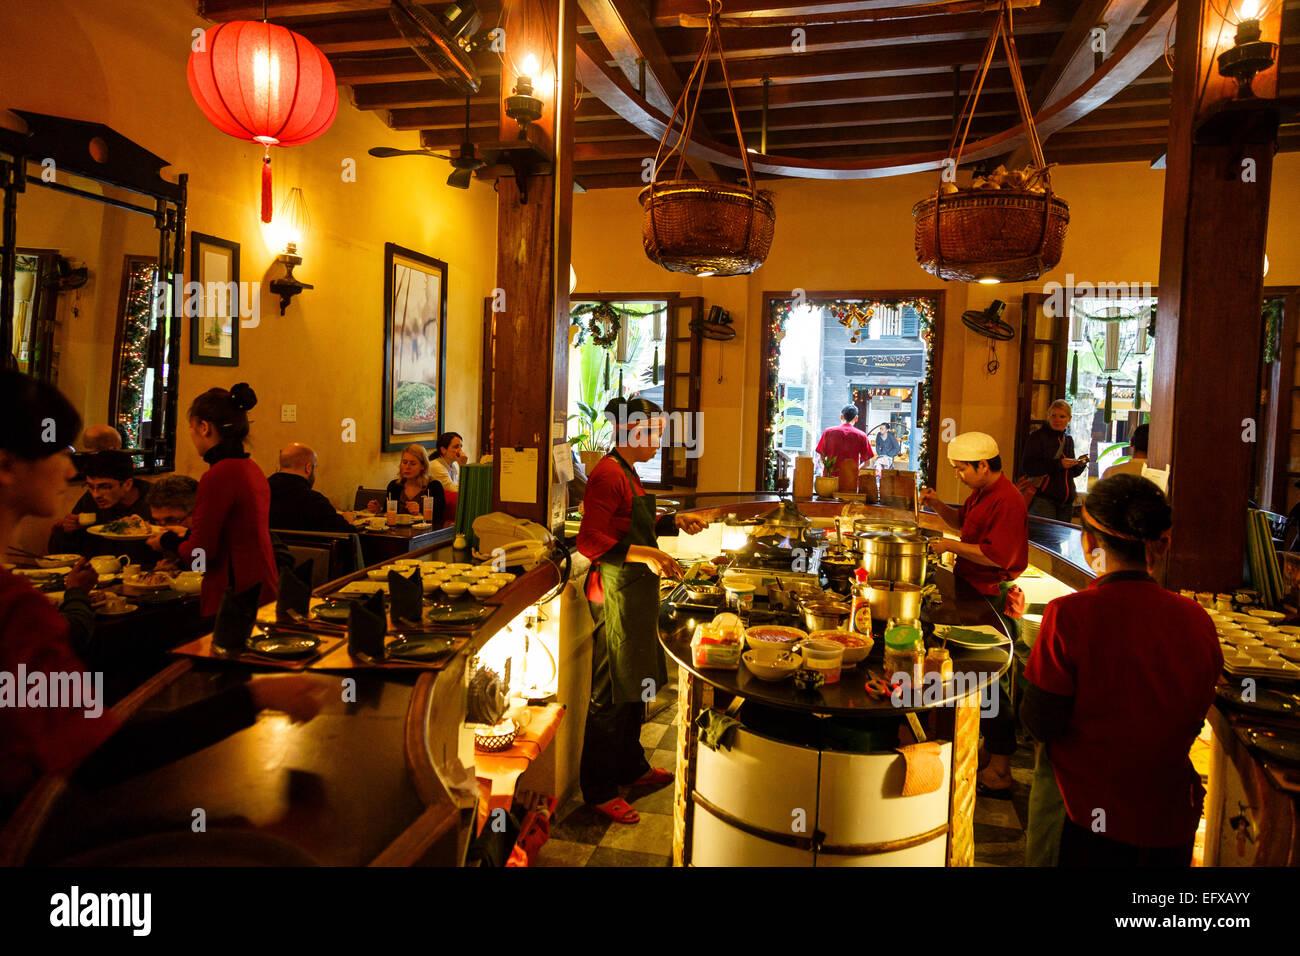 Morning Glory restaurant, Hoi An, Vietnam. - Stock Image